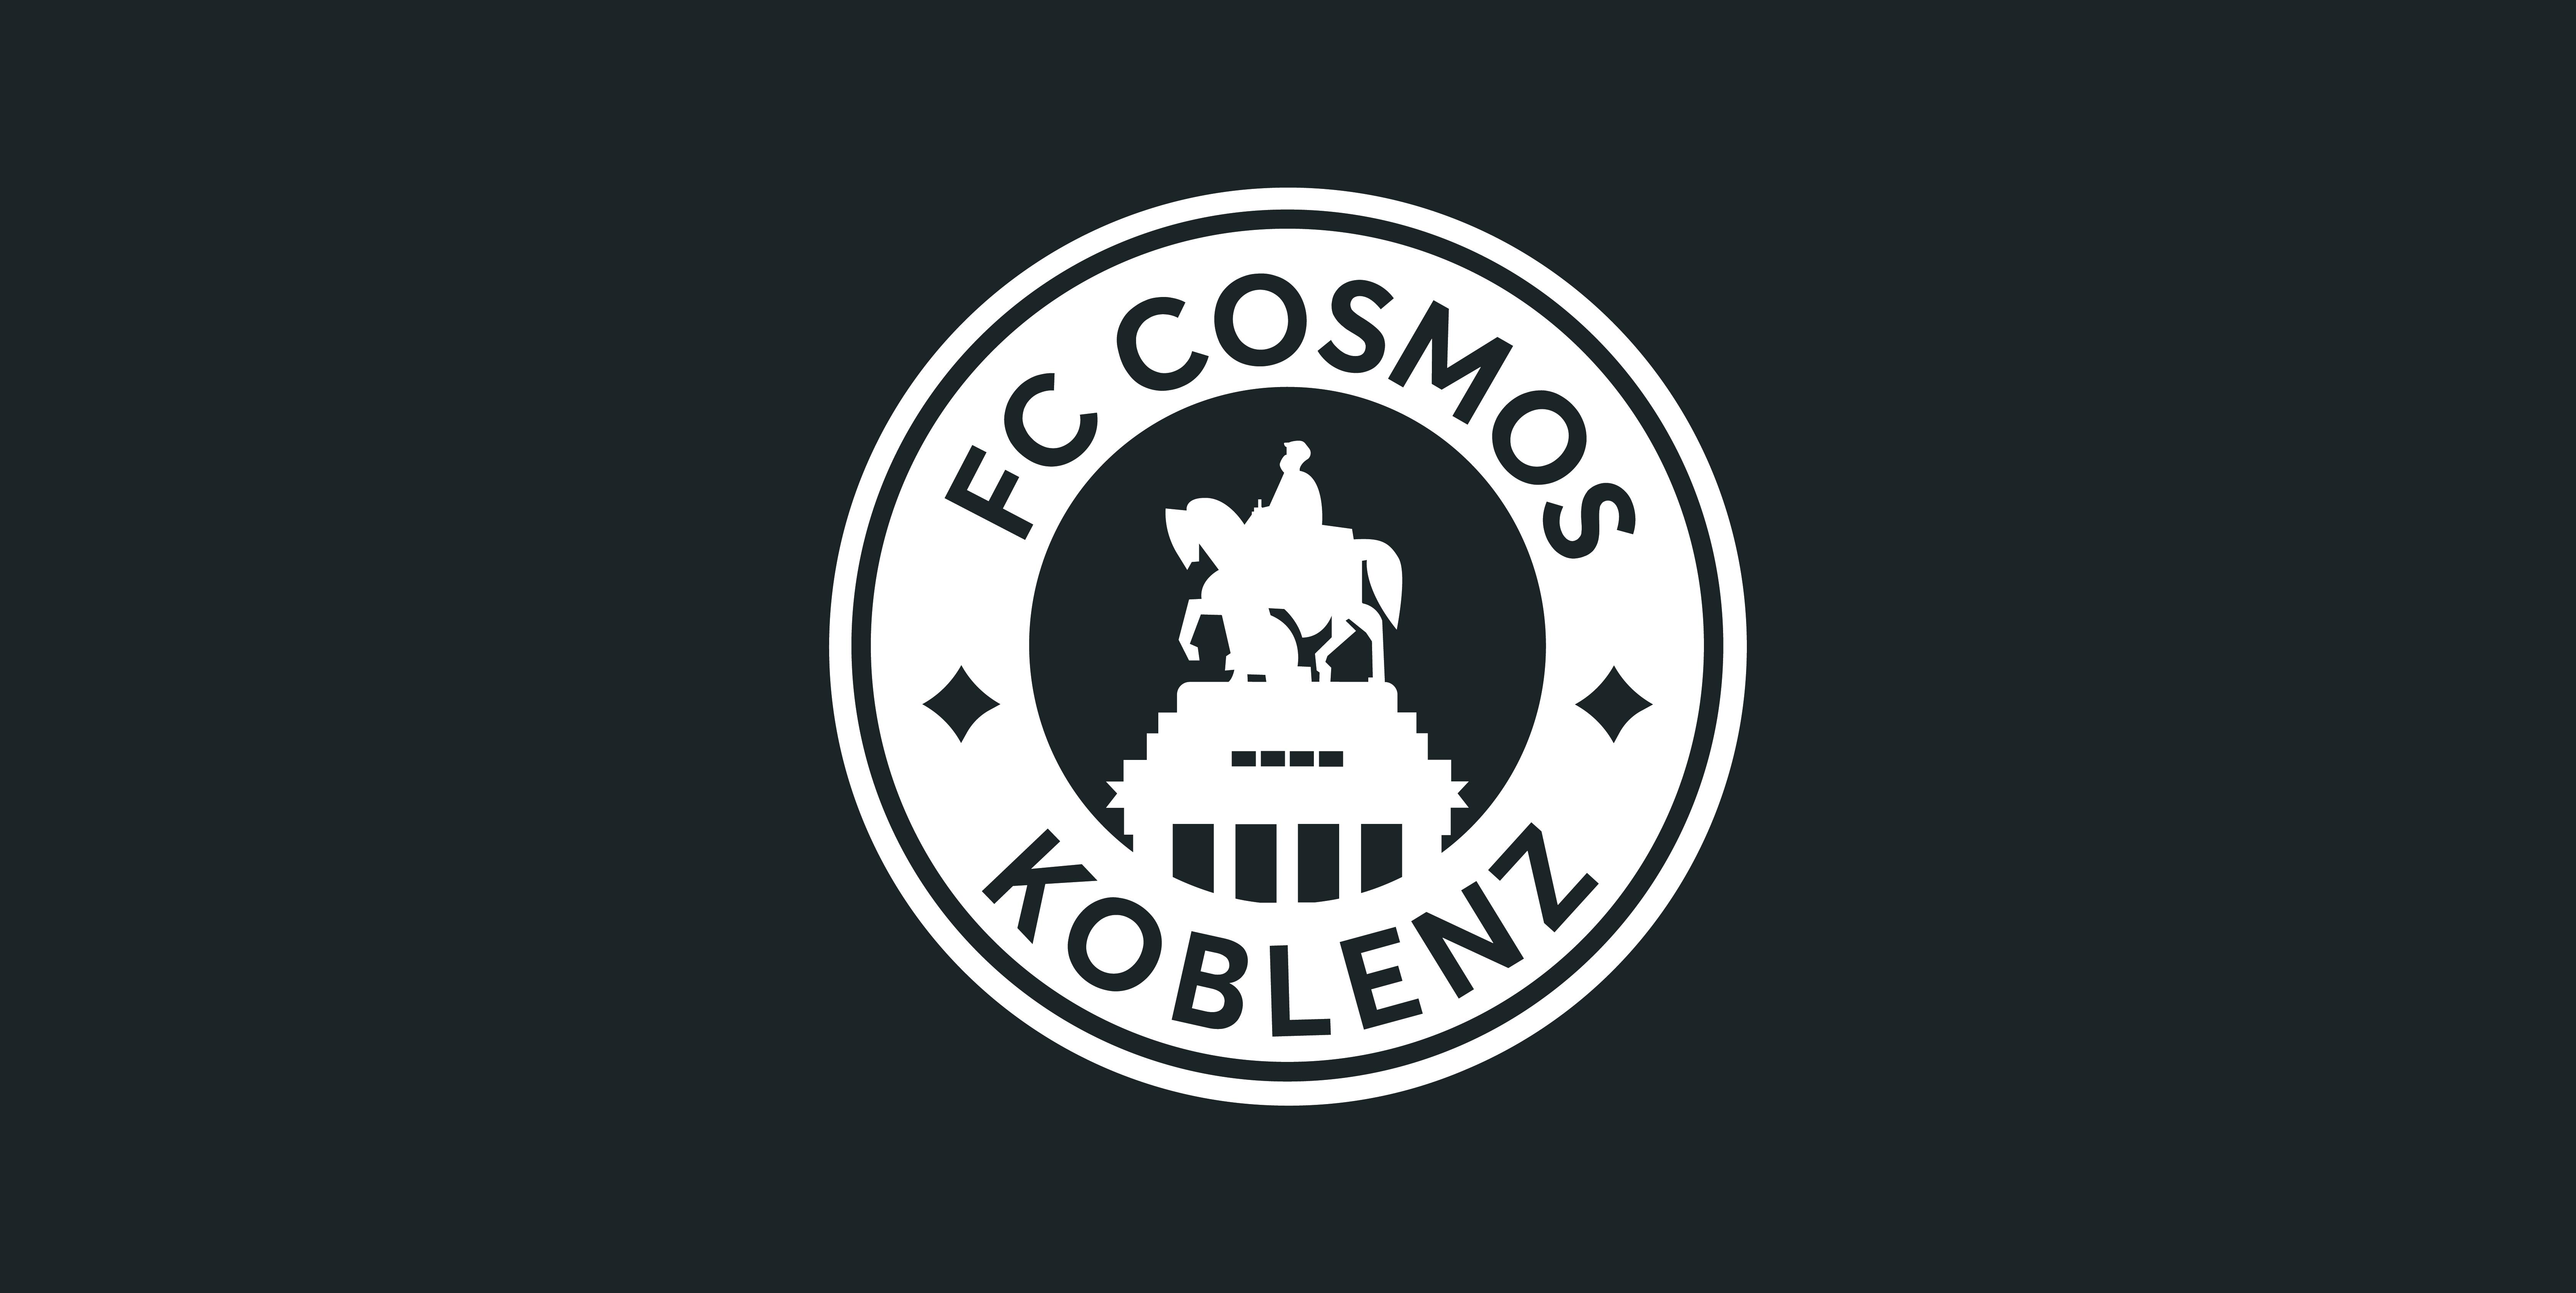 Iridium Kunde FC Cosmos Koblenz